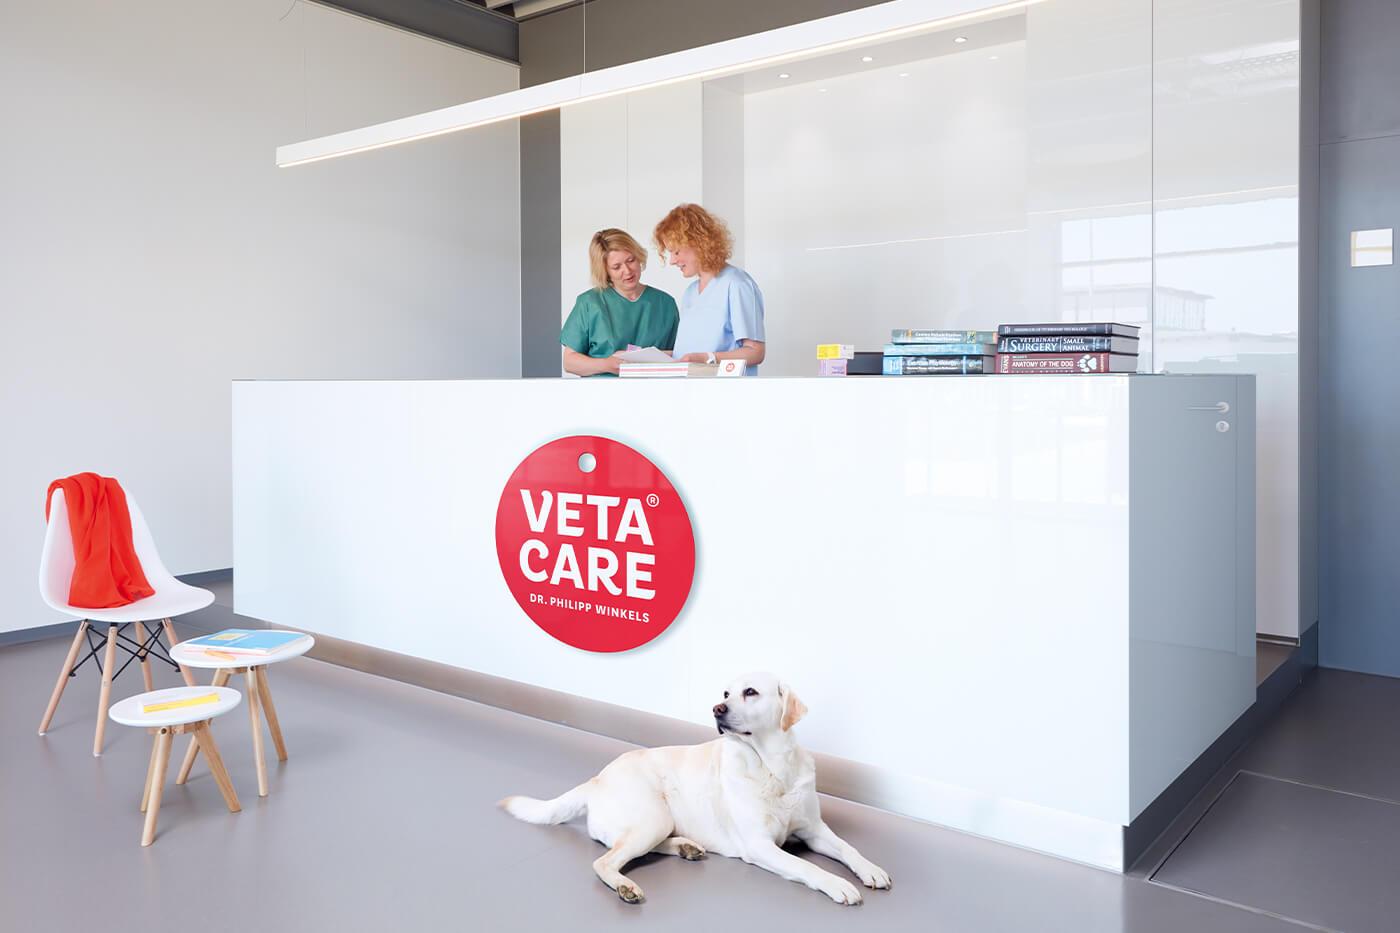 cyclos veta care praxis tierklinik marketing werbeagentur münster